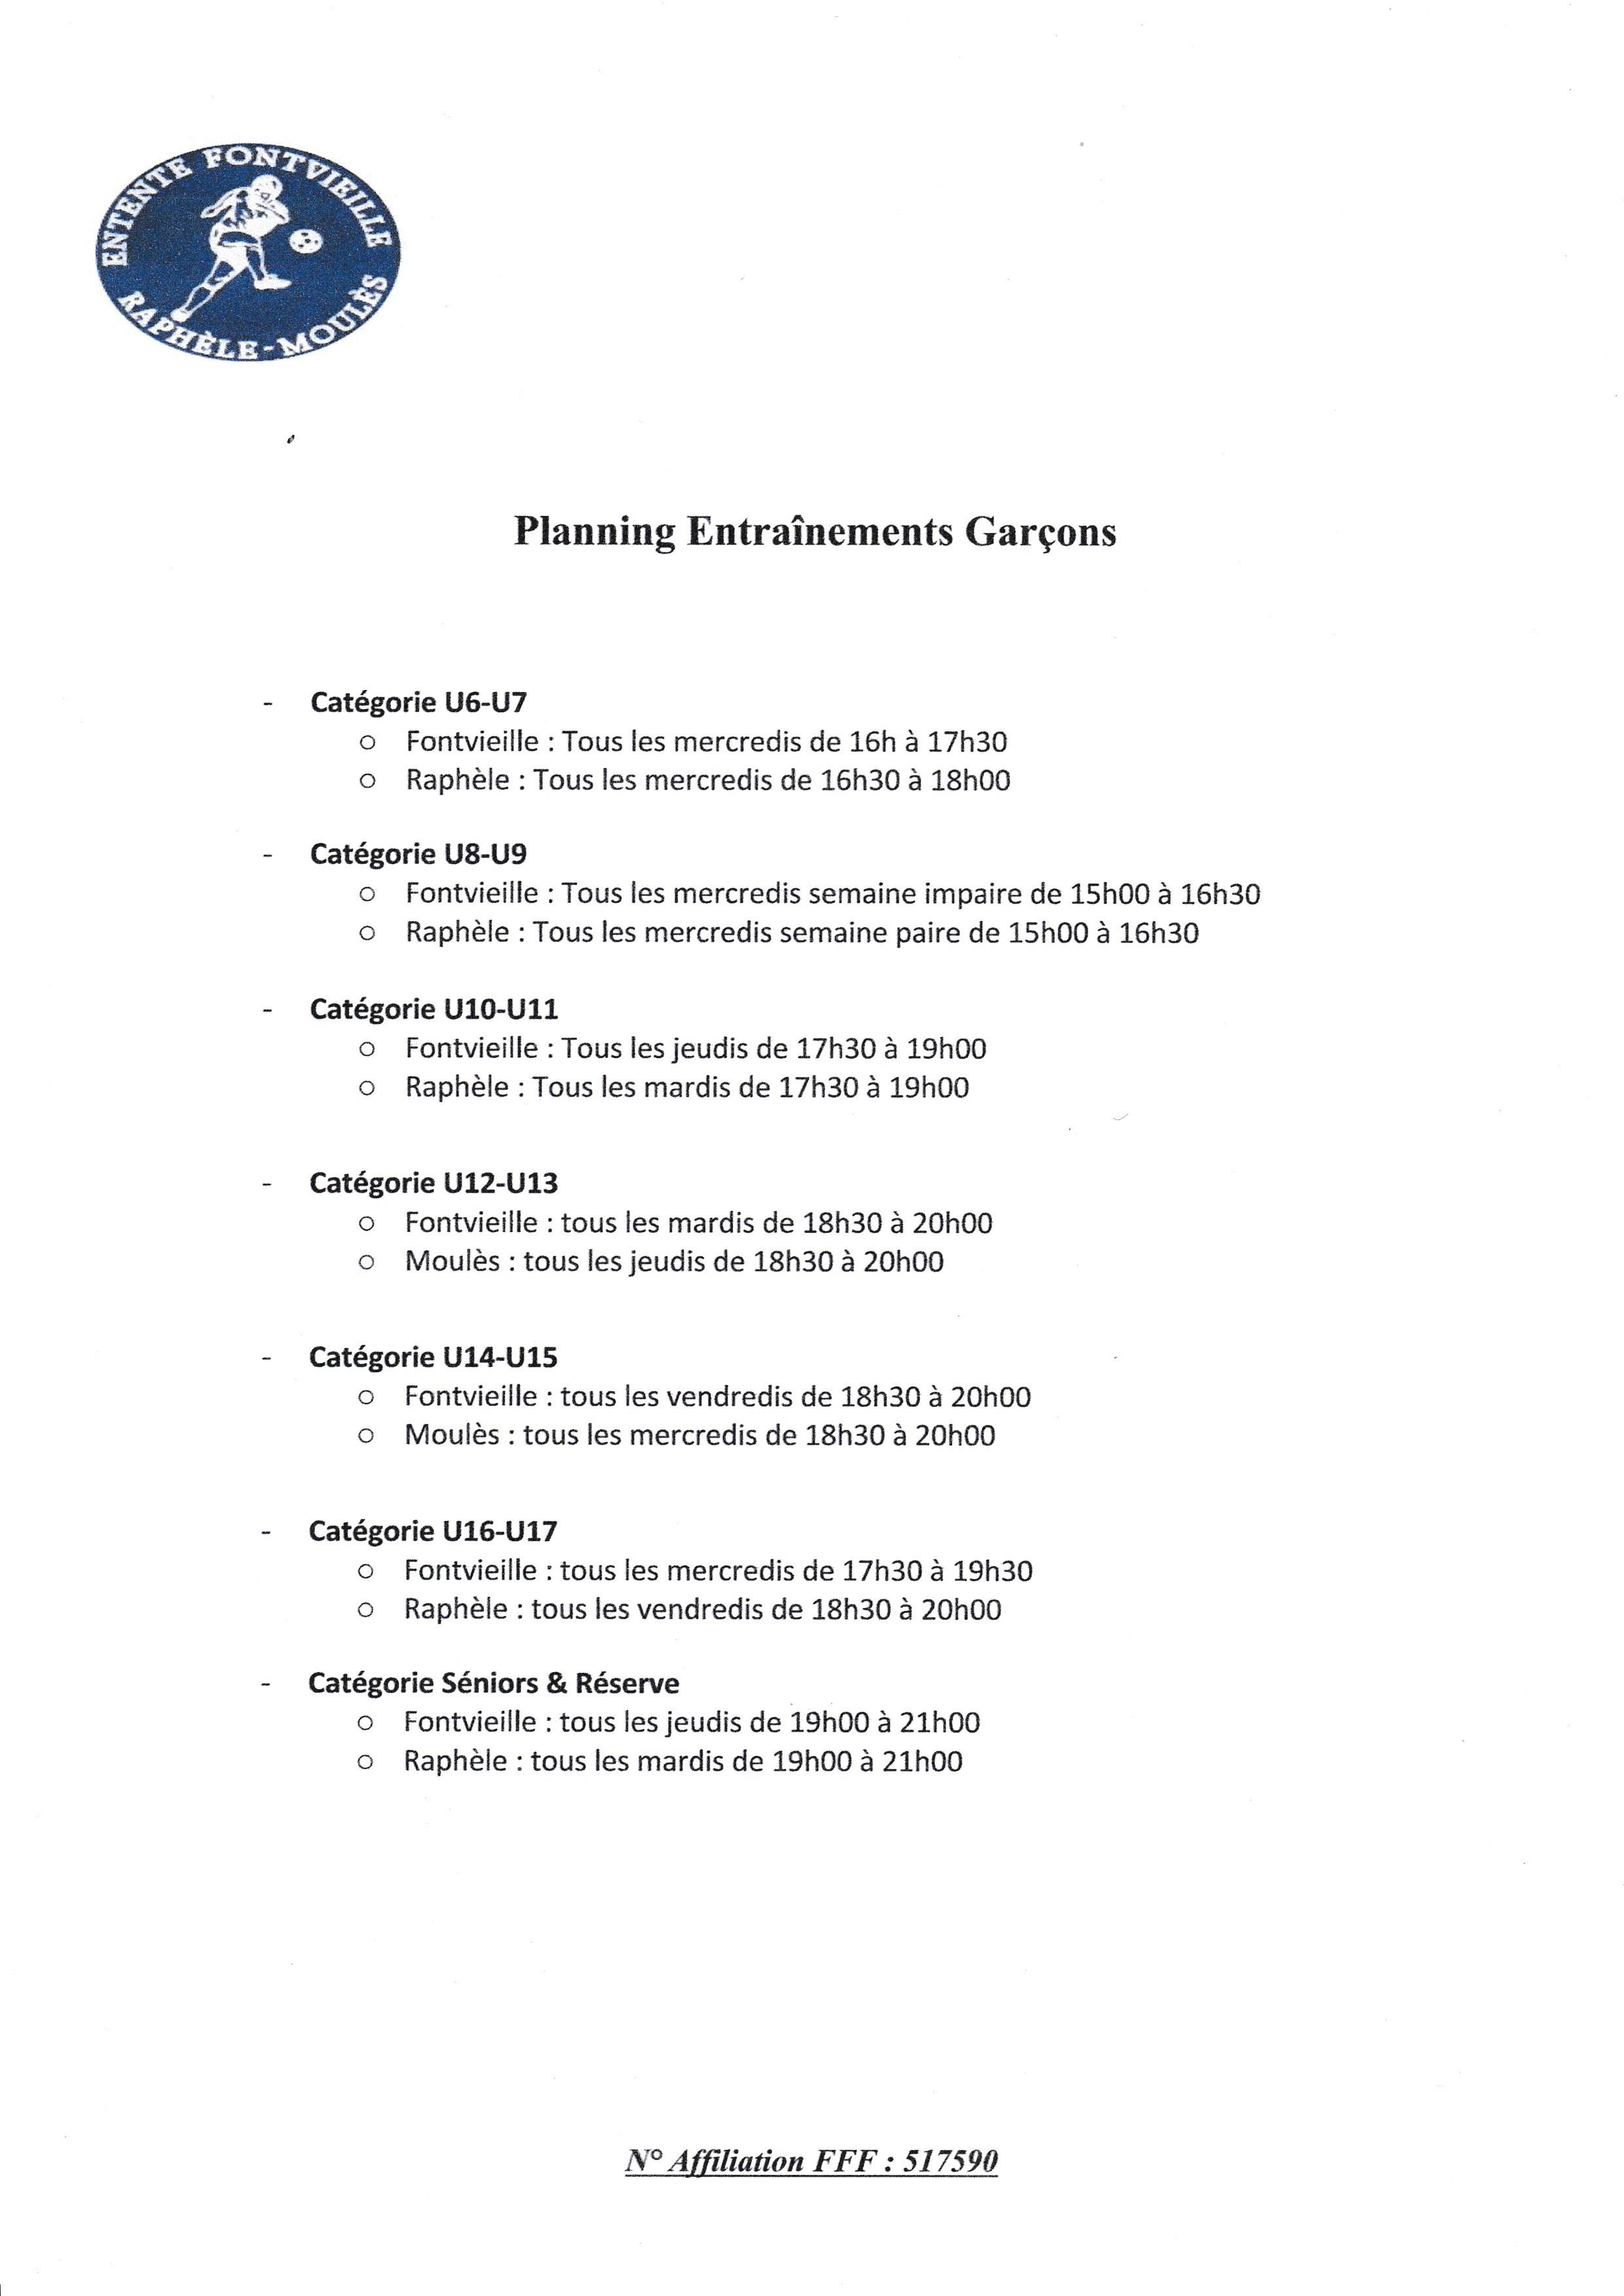 PLANNING ENTRAÎNEMENTS GARÇONS